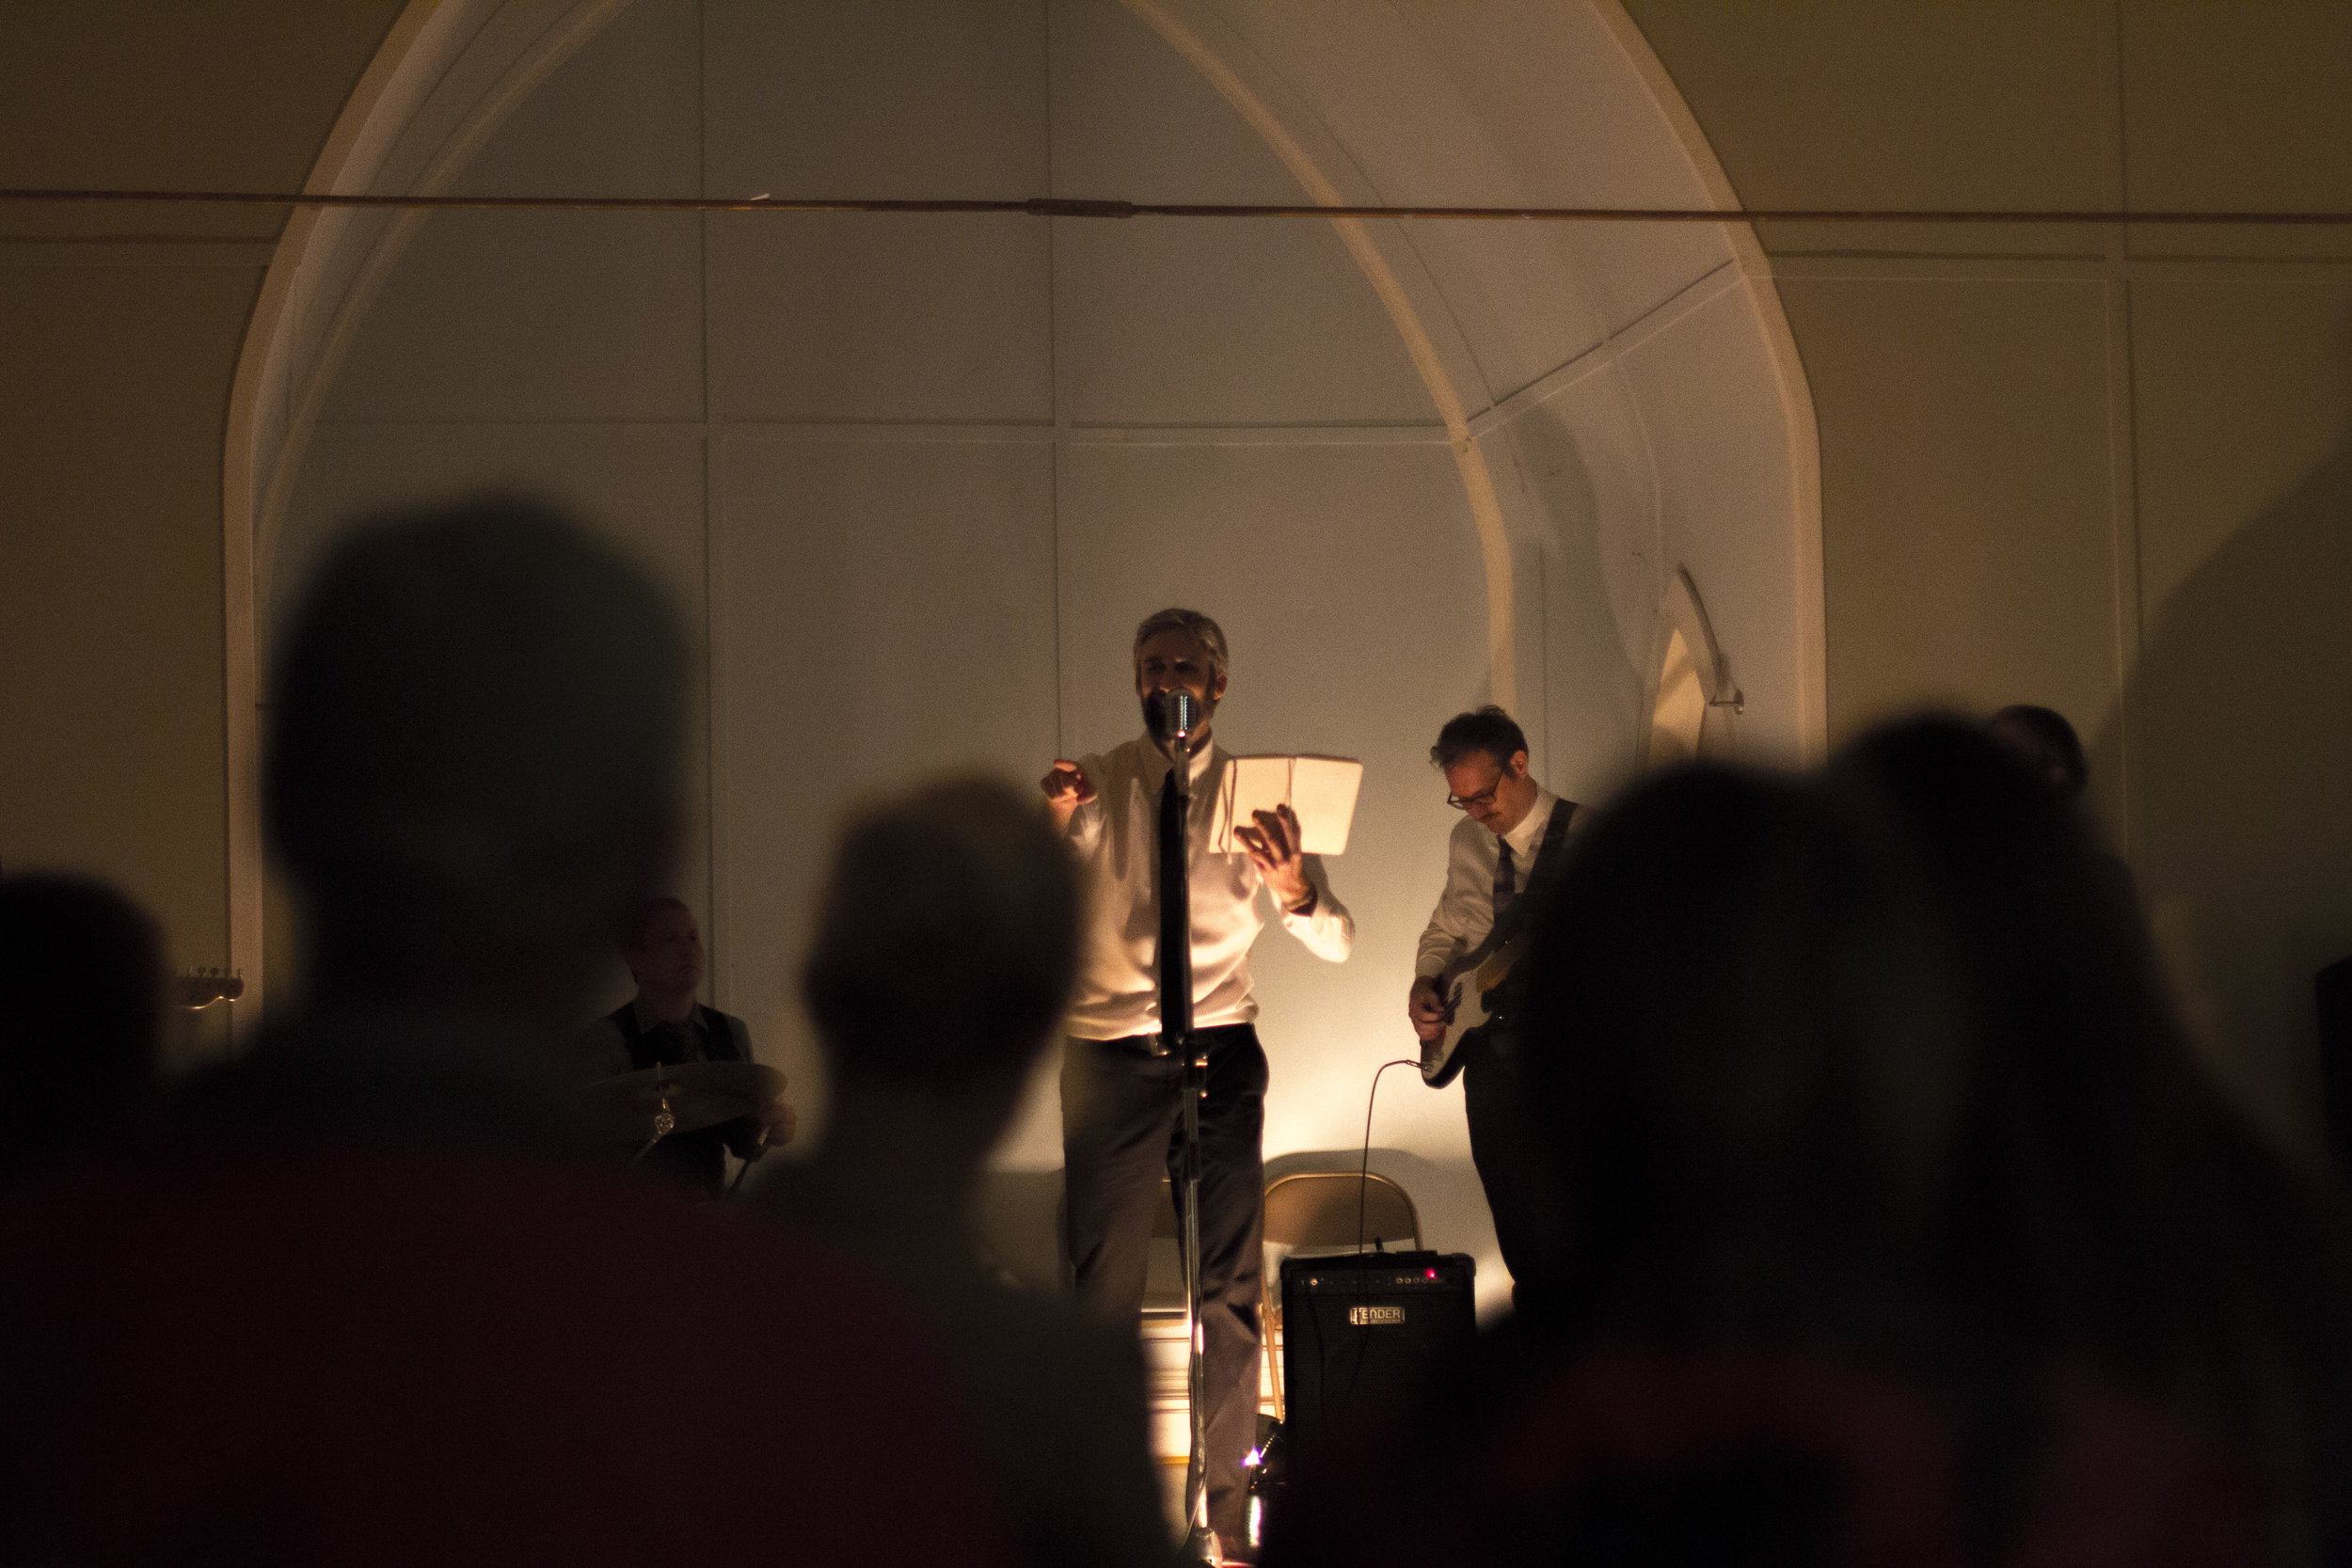 Eric Mullis, Jeremy Fisher. Odd Fellows Hall (Blacksburg, VA) on 10/13/18.